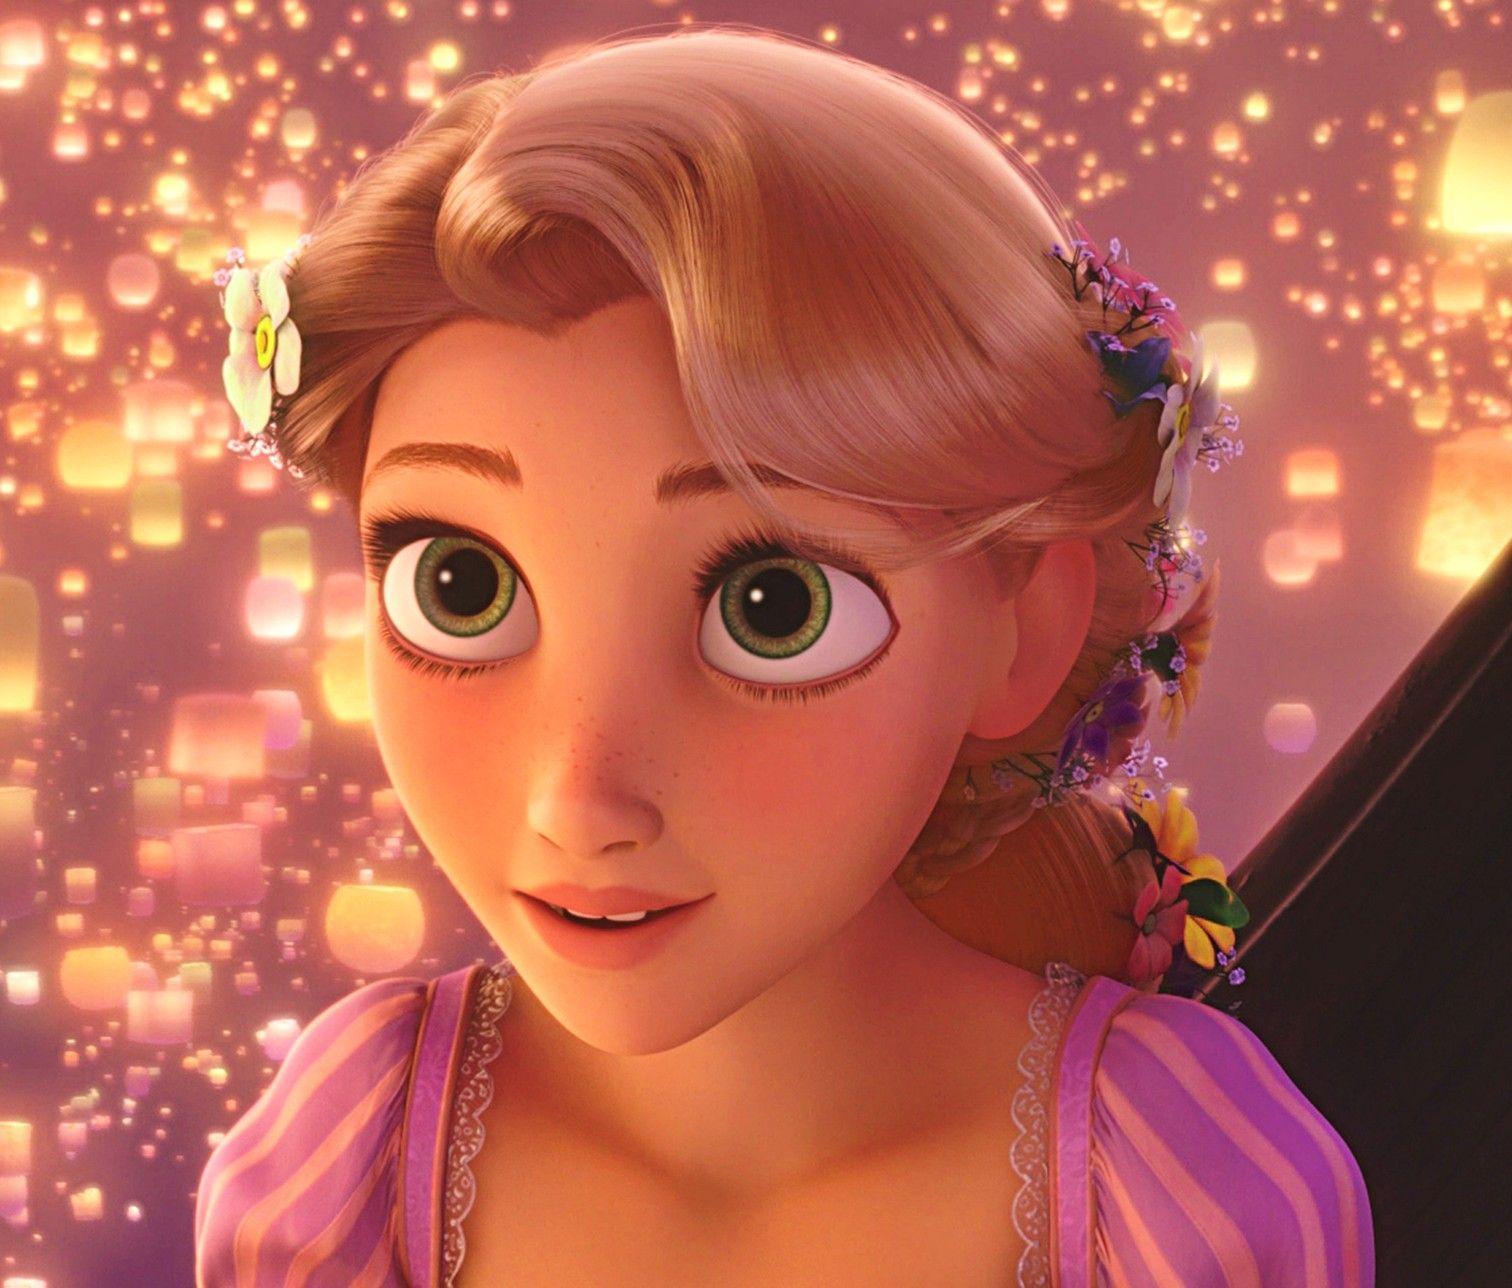 Rapunzel Wallpapers Top Free Rapunzel Backgrounds